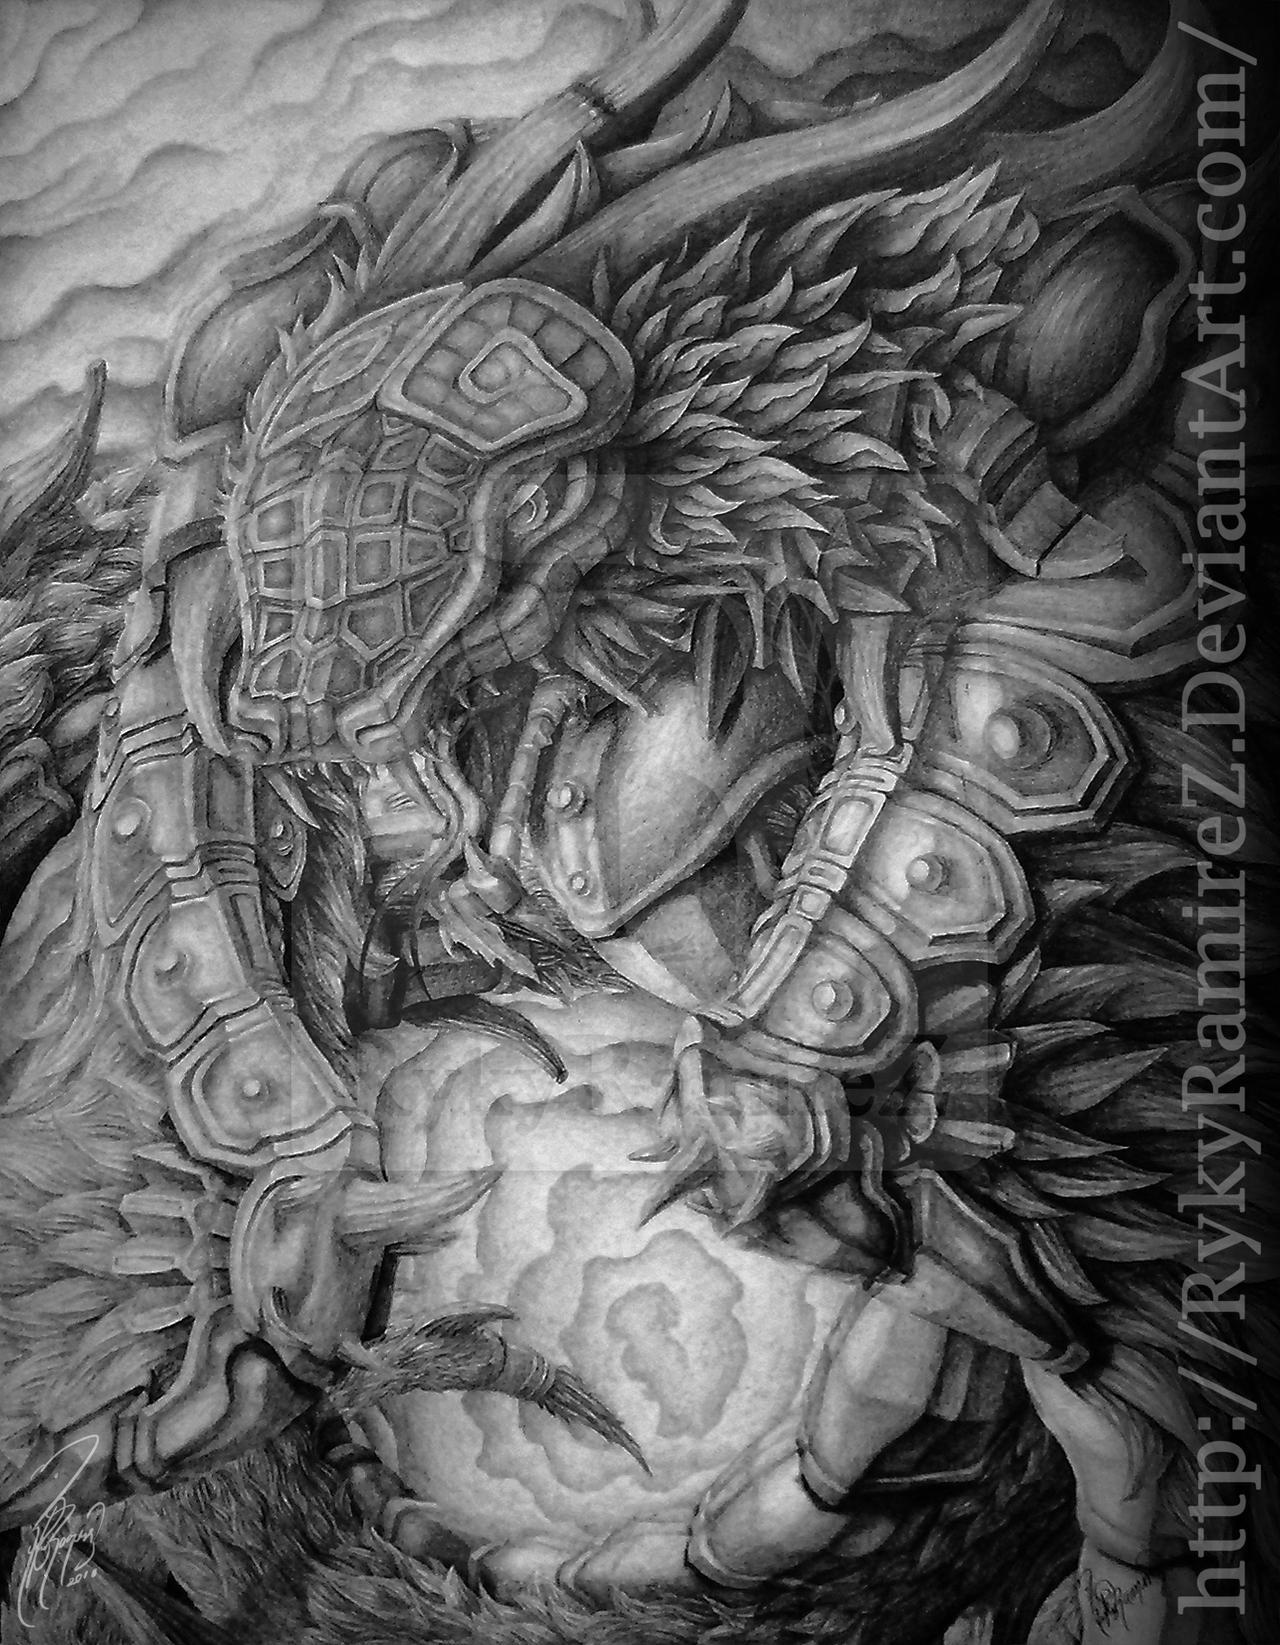 Quetzalcoatl 2010 by rykyramirez on DeviantArt